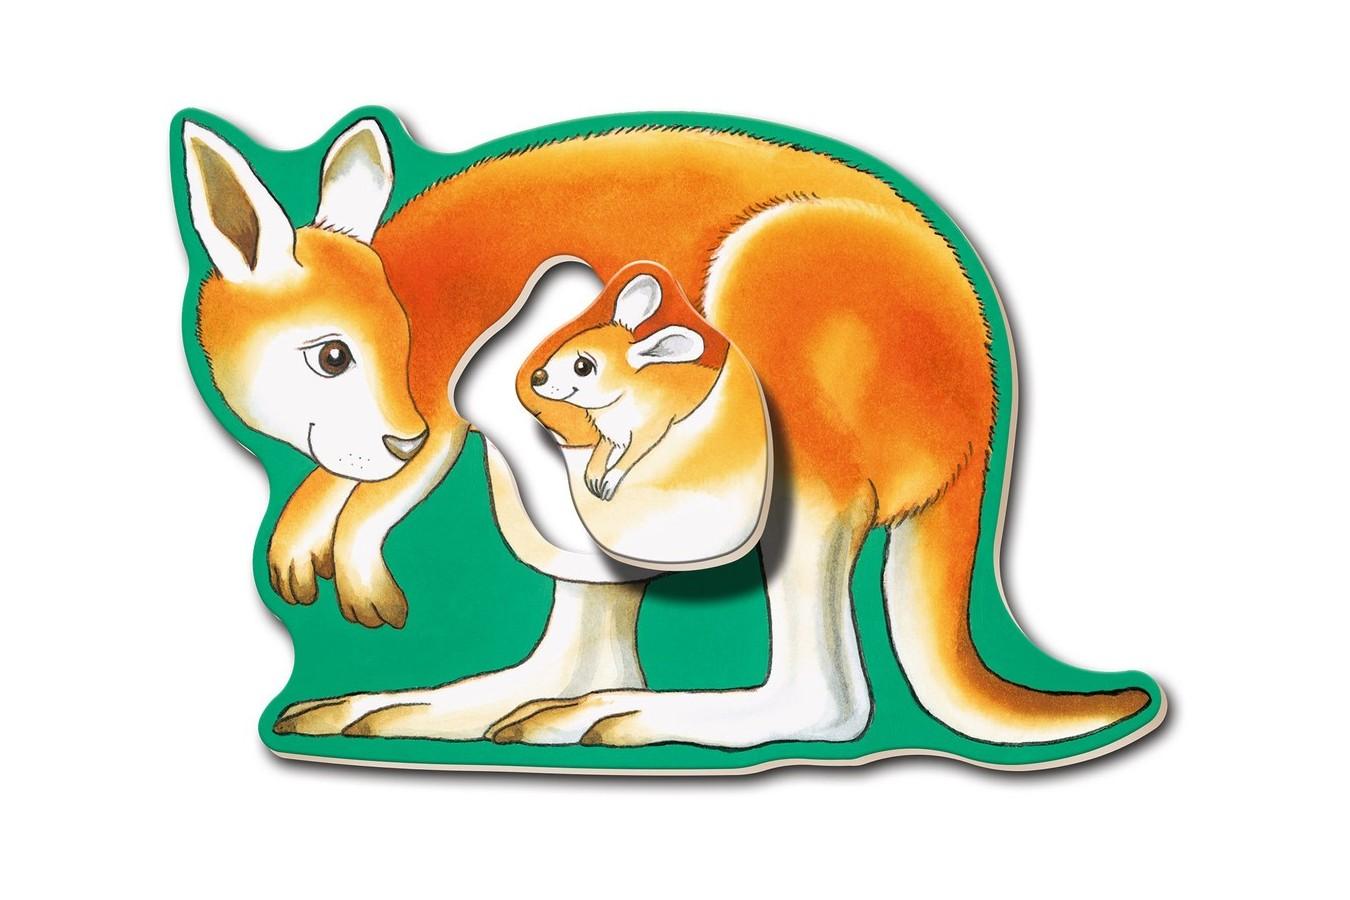 Primul Meu Puzzle Ravensburger - Animalute, 6X2 Piese